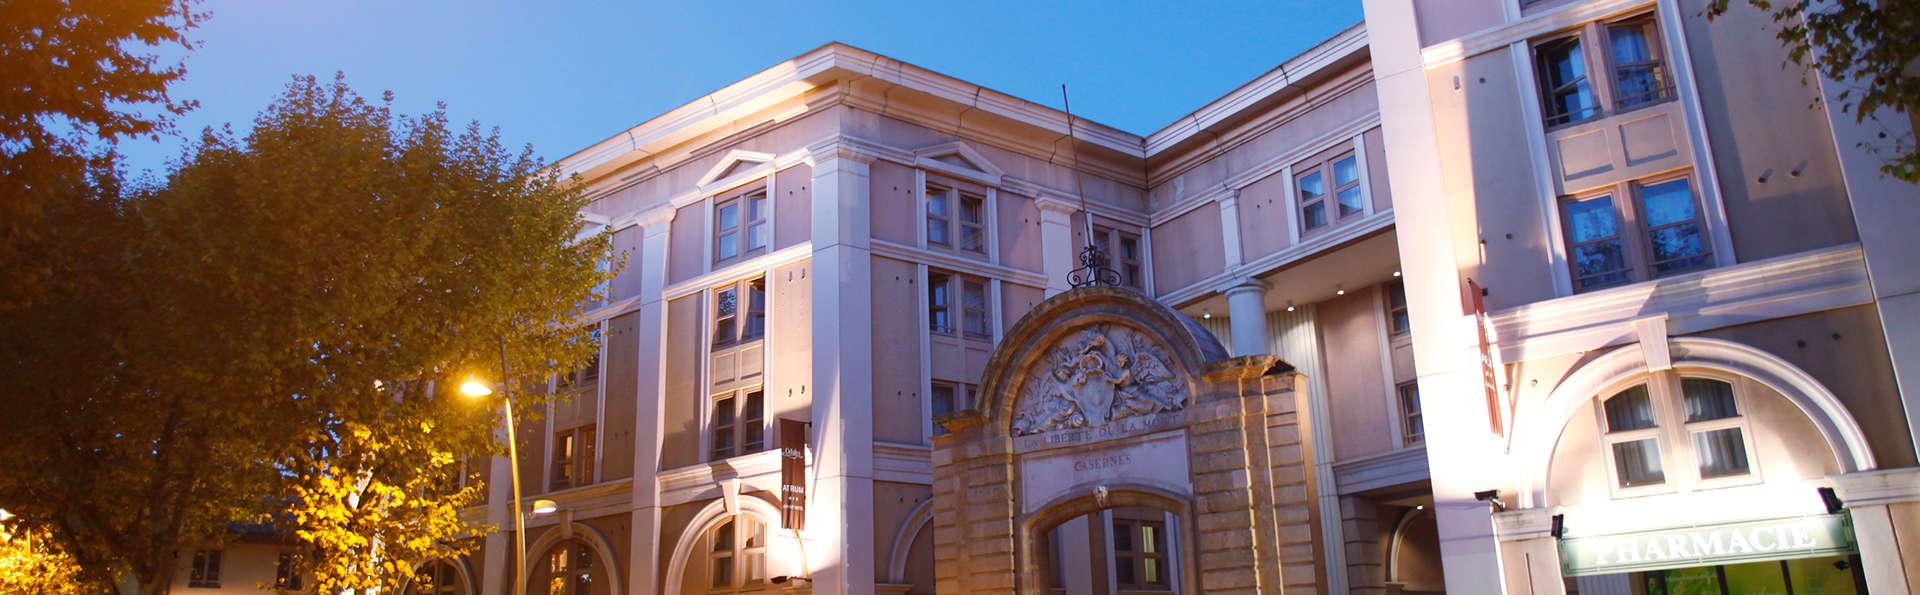 Appart'hôtel Odalys Atrium - EDIT_front1.jpg